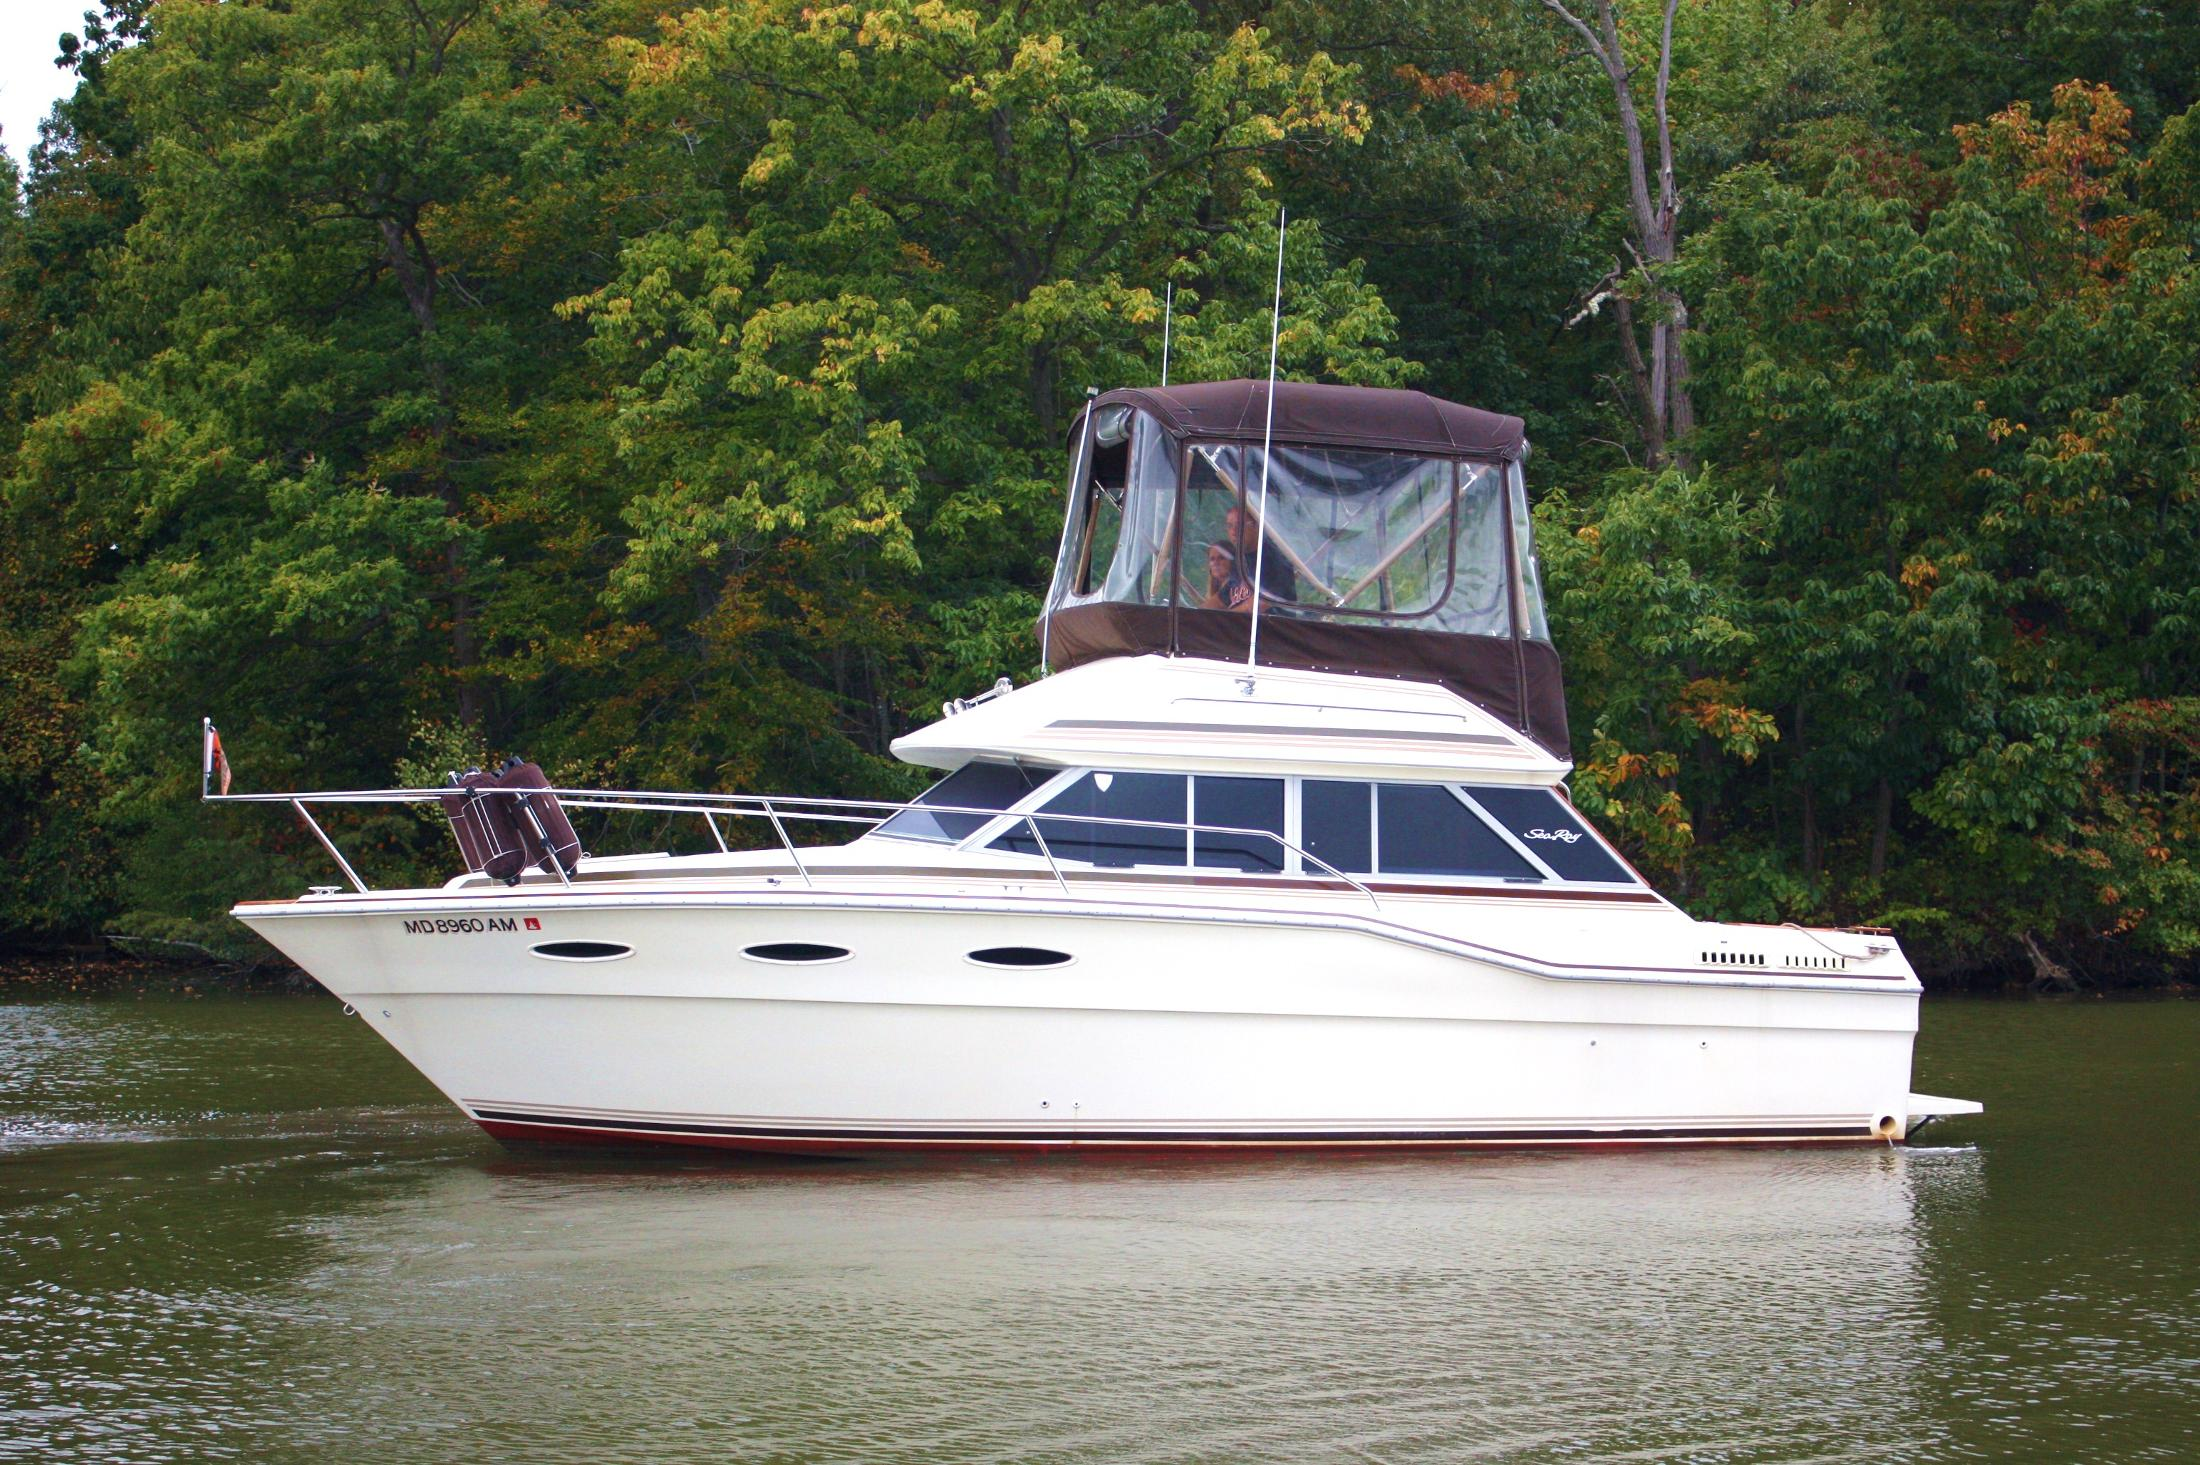 4006844_20121006114352_1_XLARGE&w=2200&h=1465&t=1410971127000 1985 sea ray 300 sedan bridge power boat for sale www yachtworld com  at webbmarketing.co